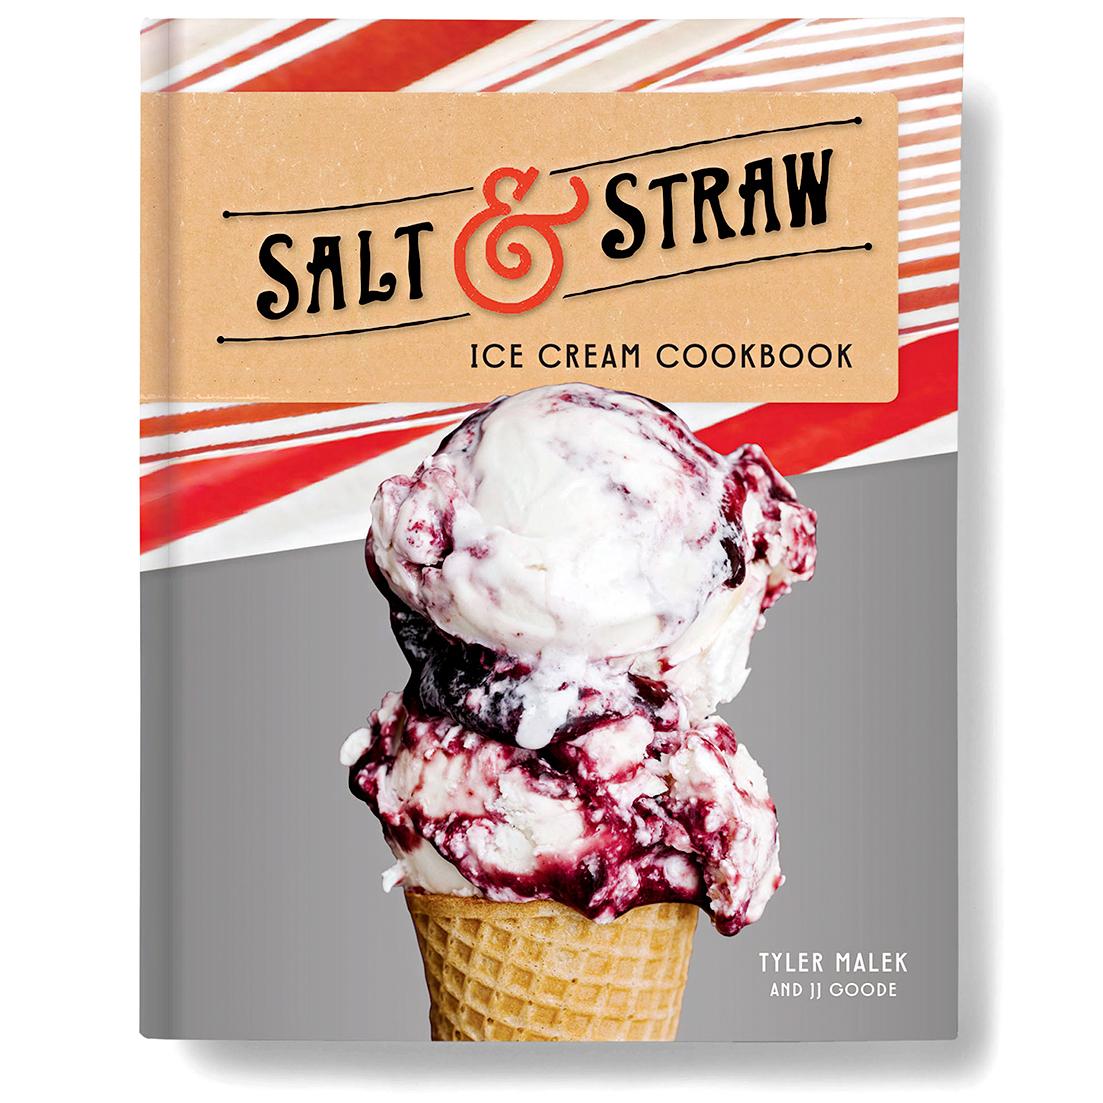 salt and straw ice cream cookbook cover